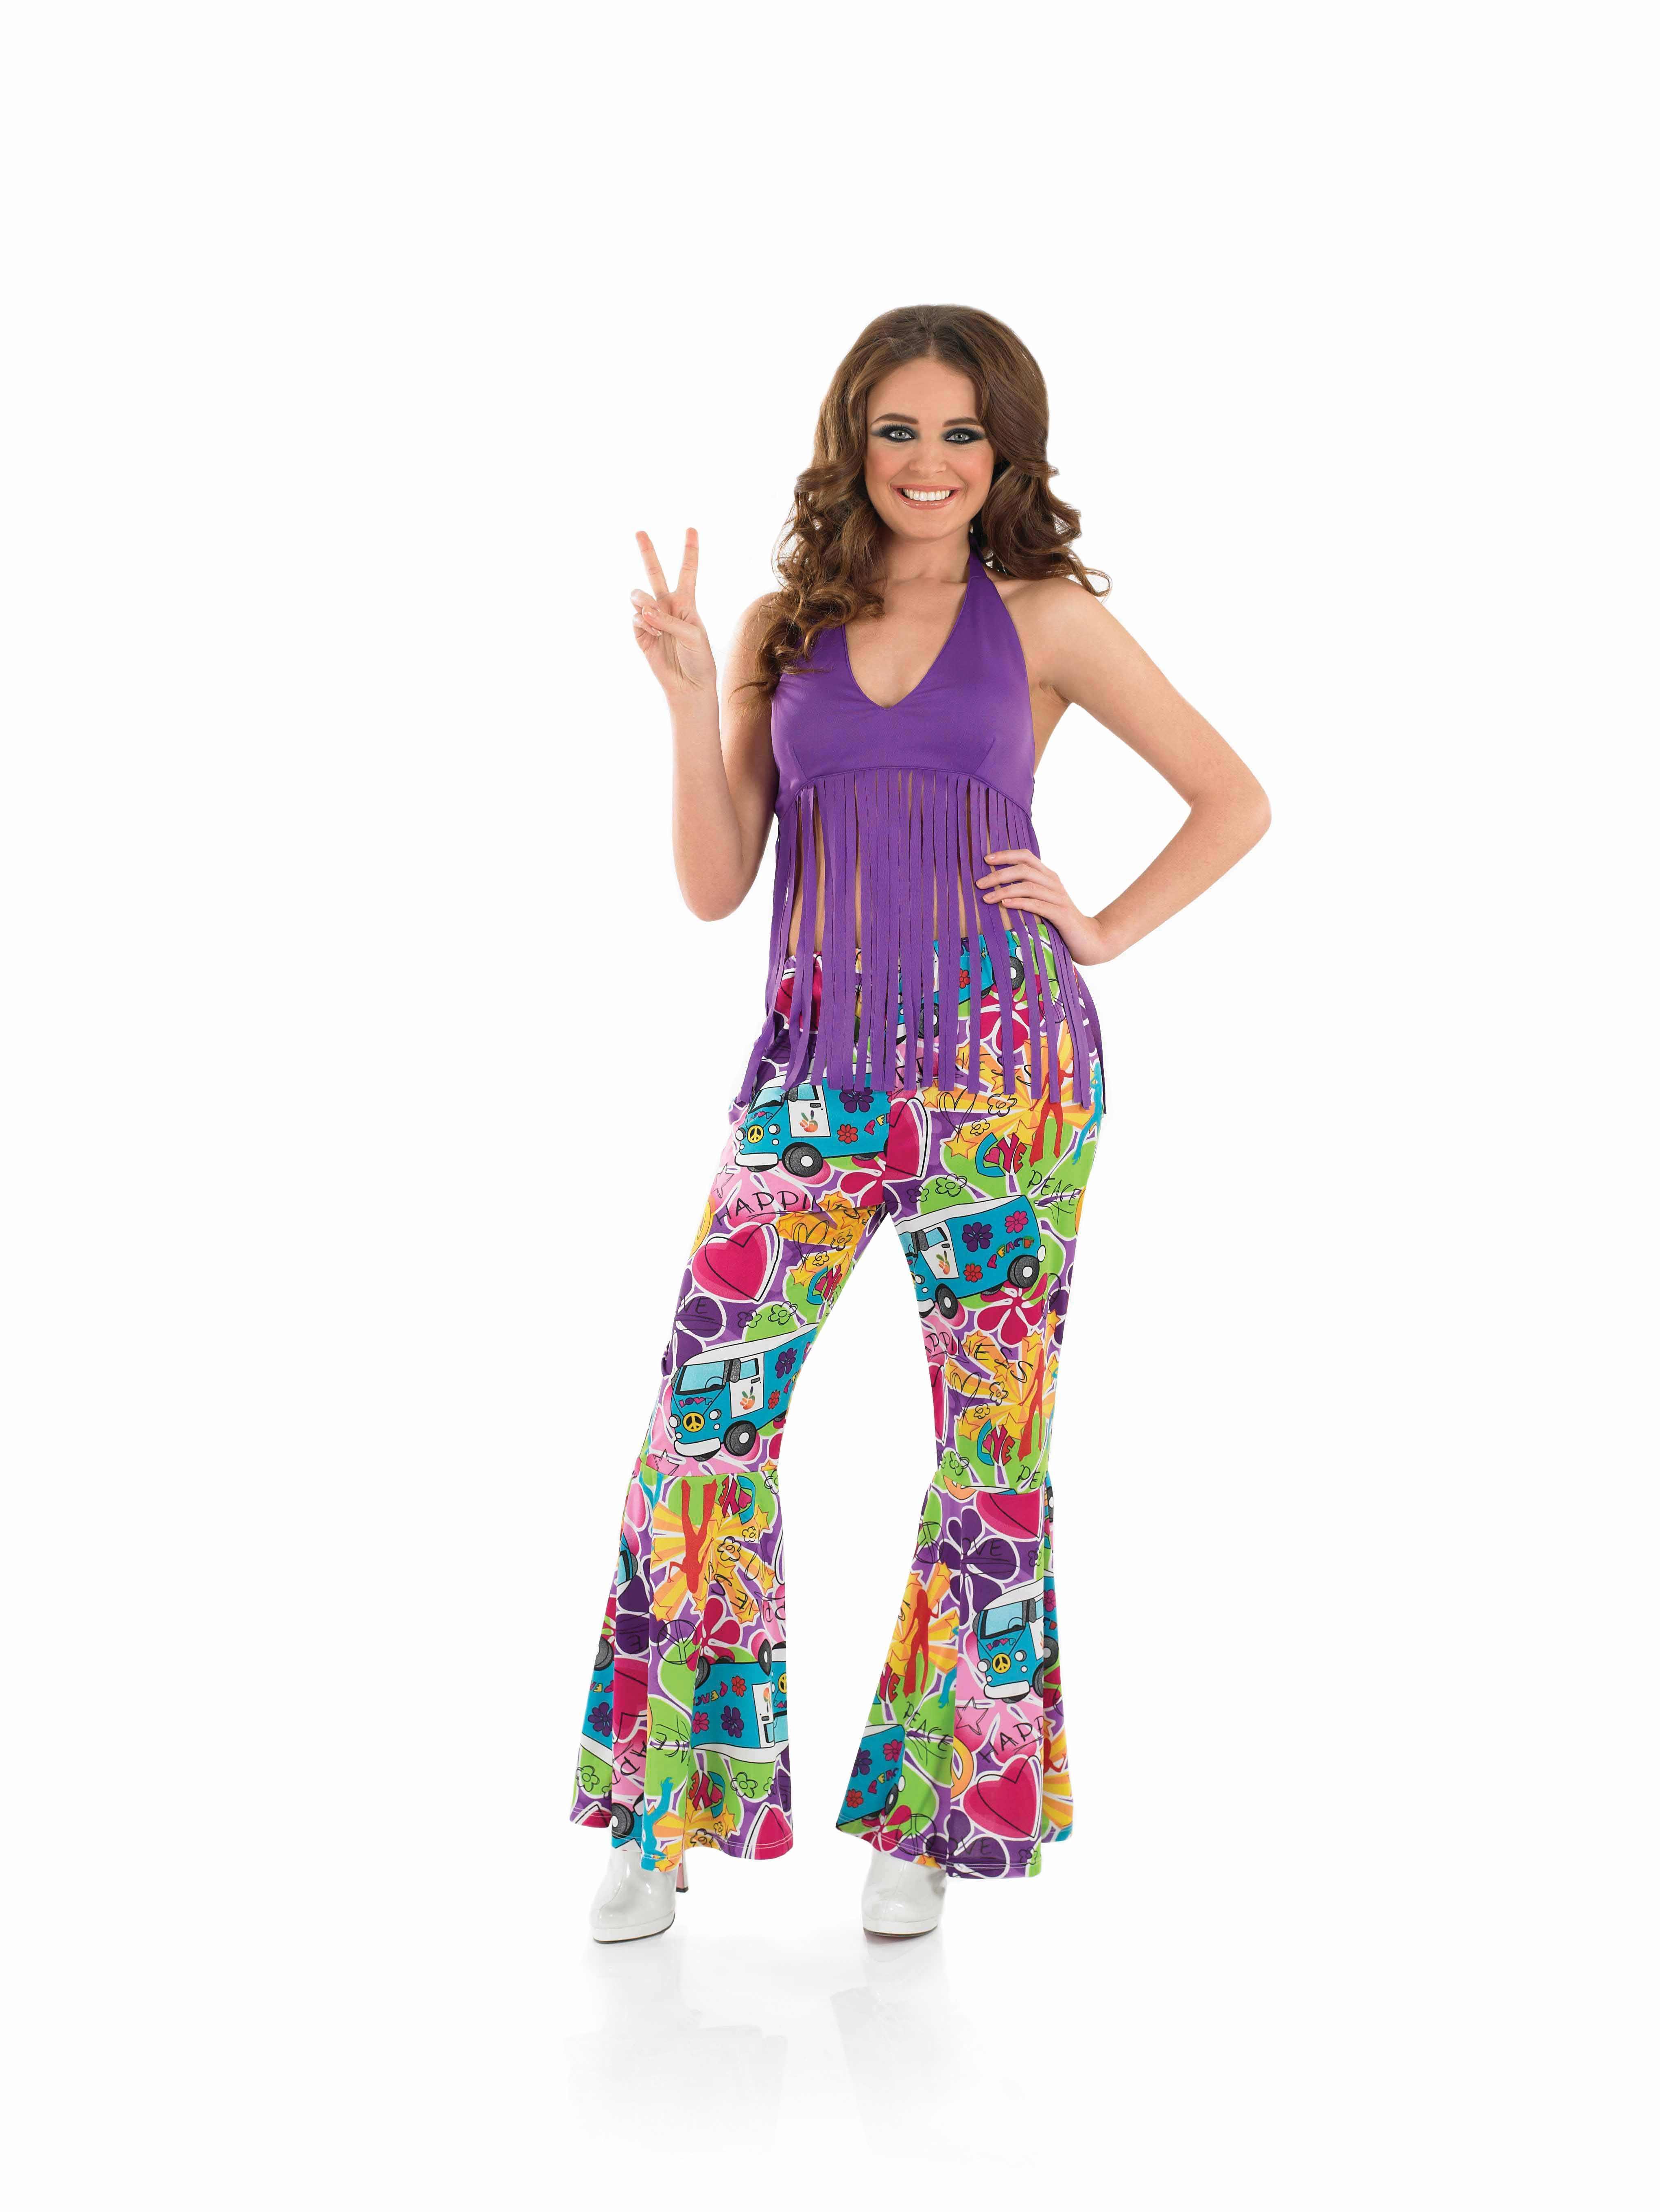 Unique  Hippie Disco Groovy Flower Power Women Dress Up Costume SmallMedium